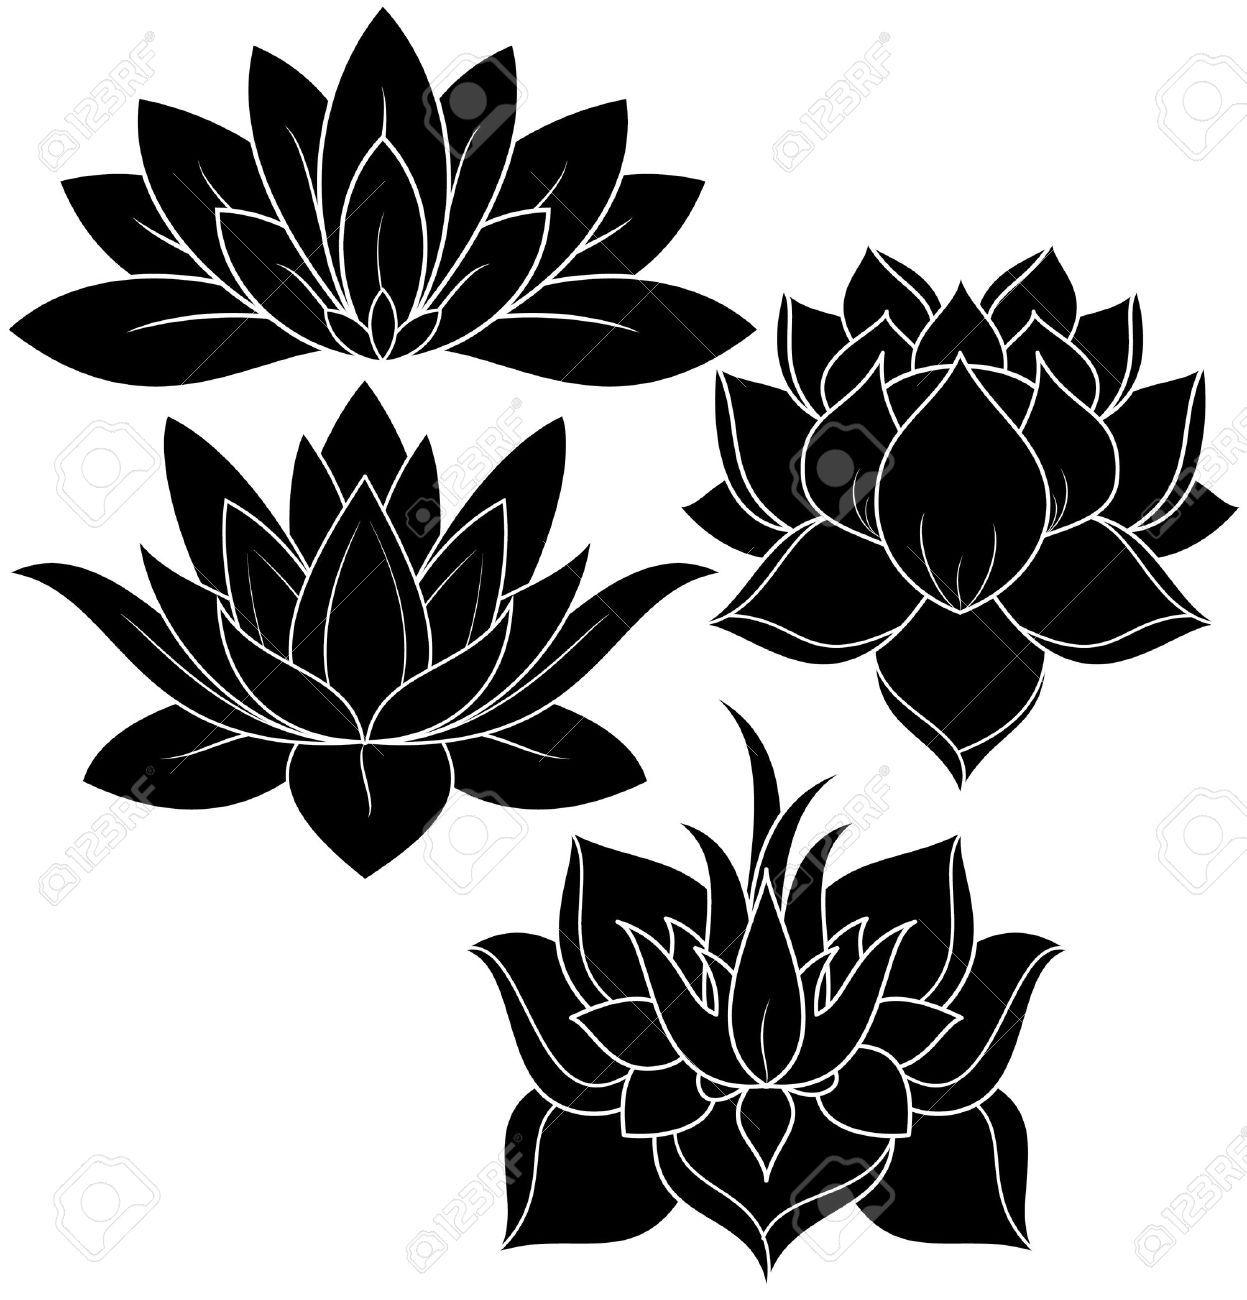 Stock Vector Flower tattoos, Silhouette tattoos, Lotus